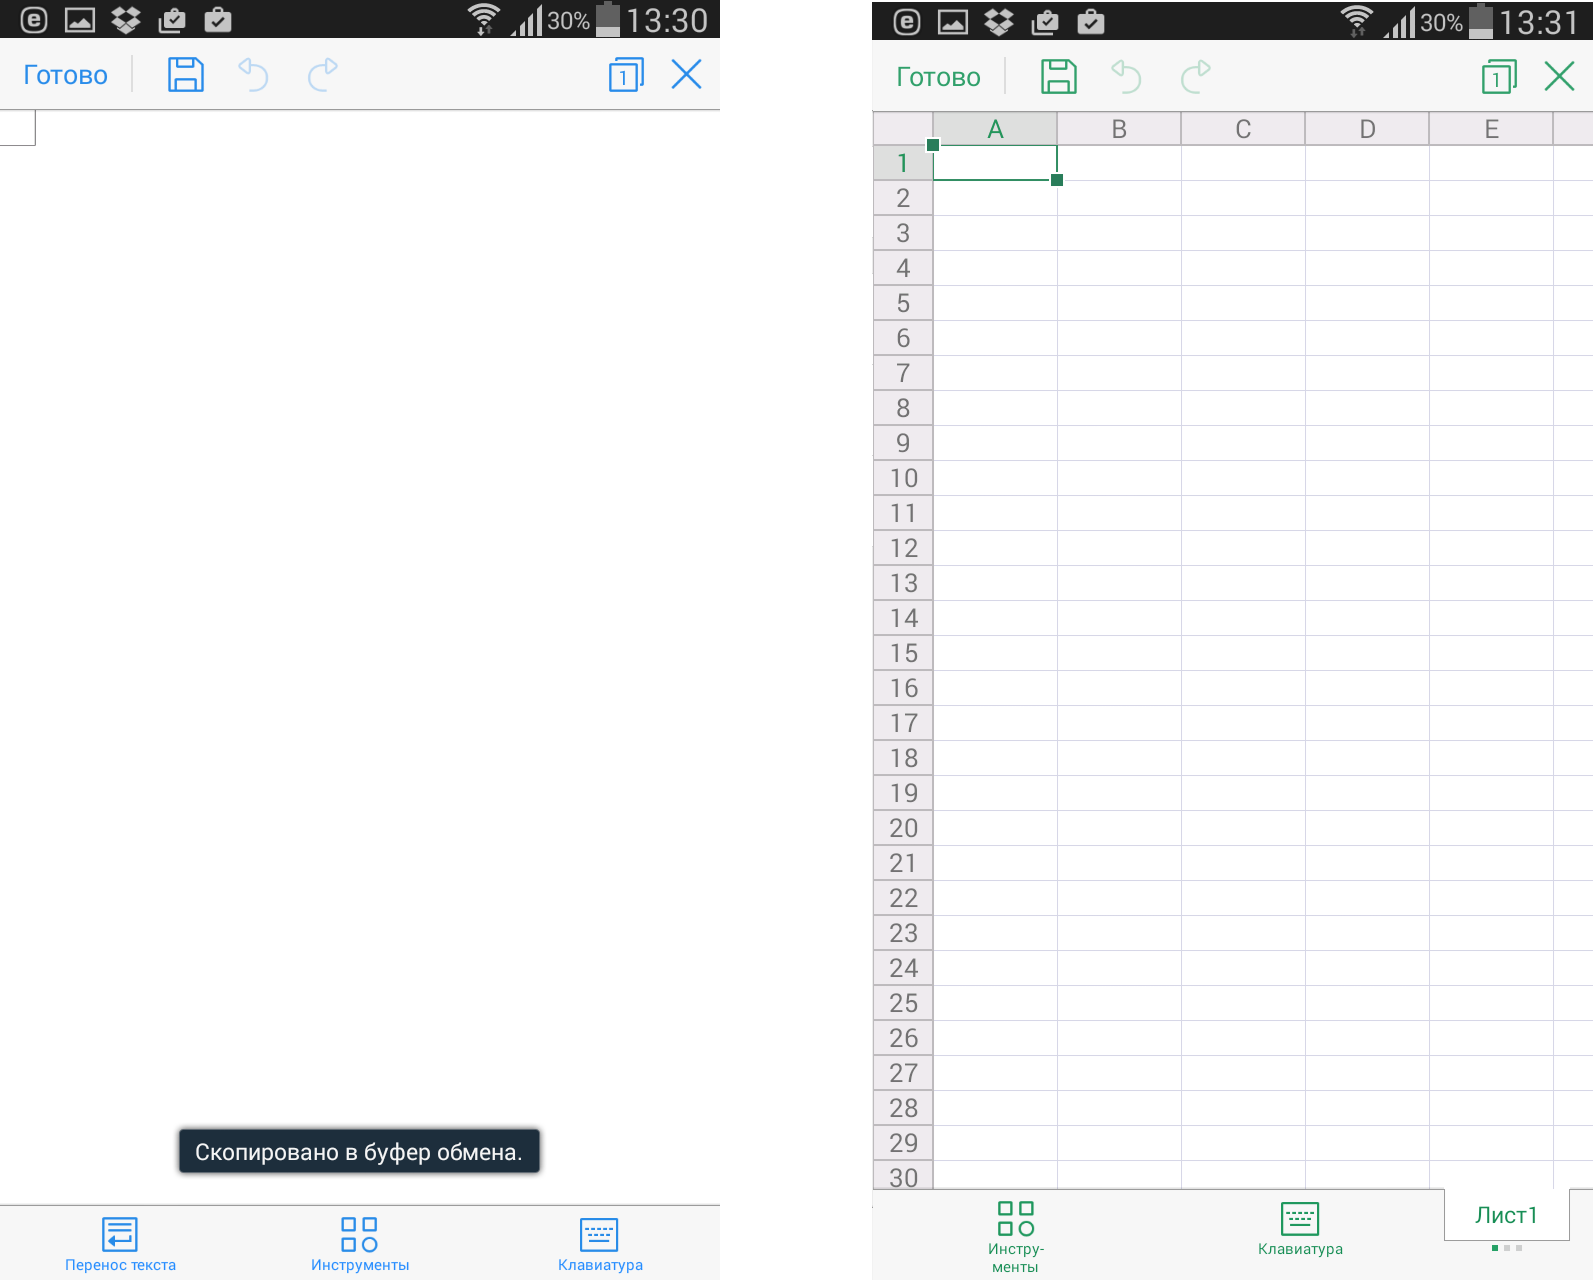 ТОП-20 приложений для Android - WPS Office